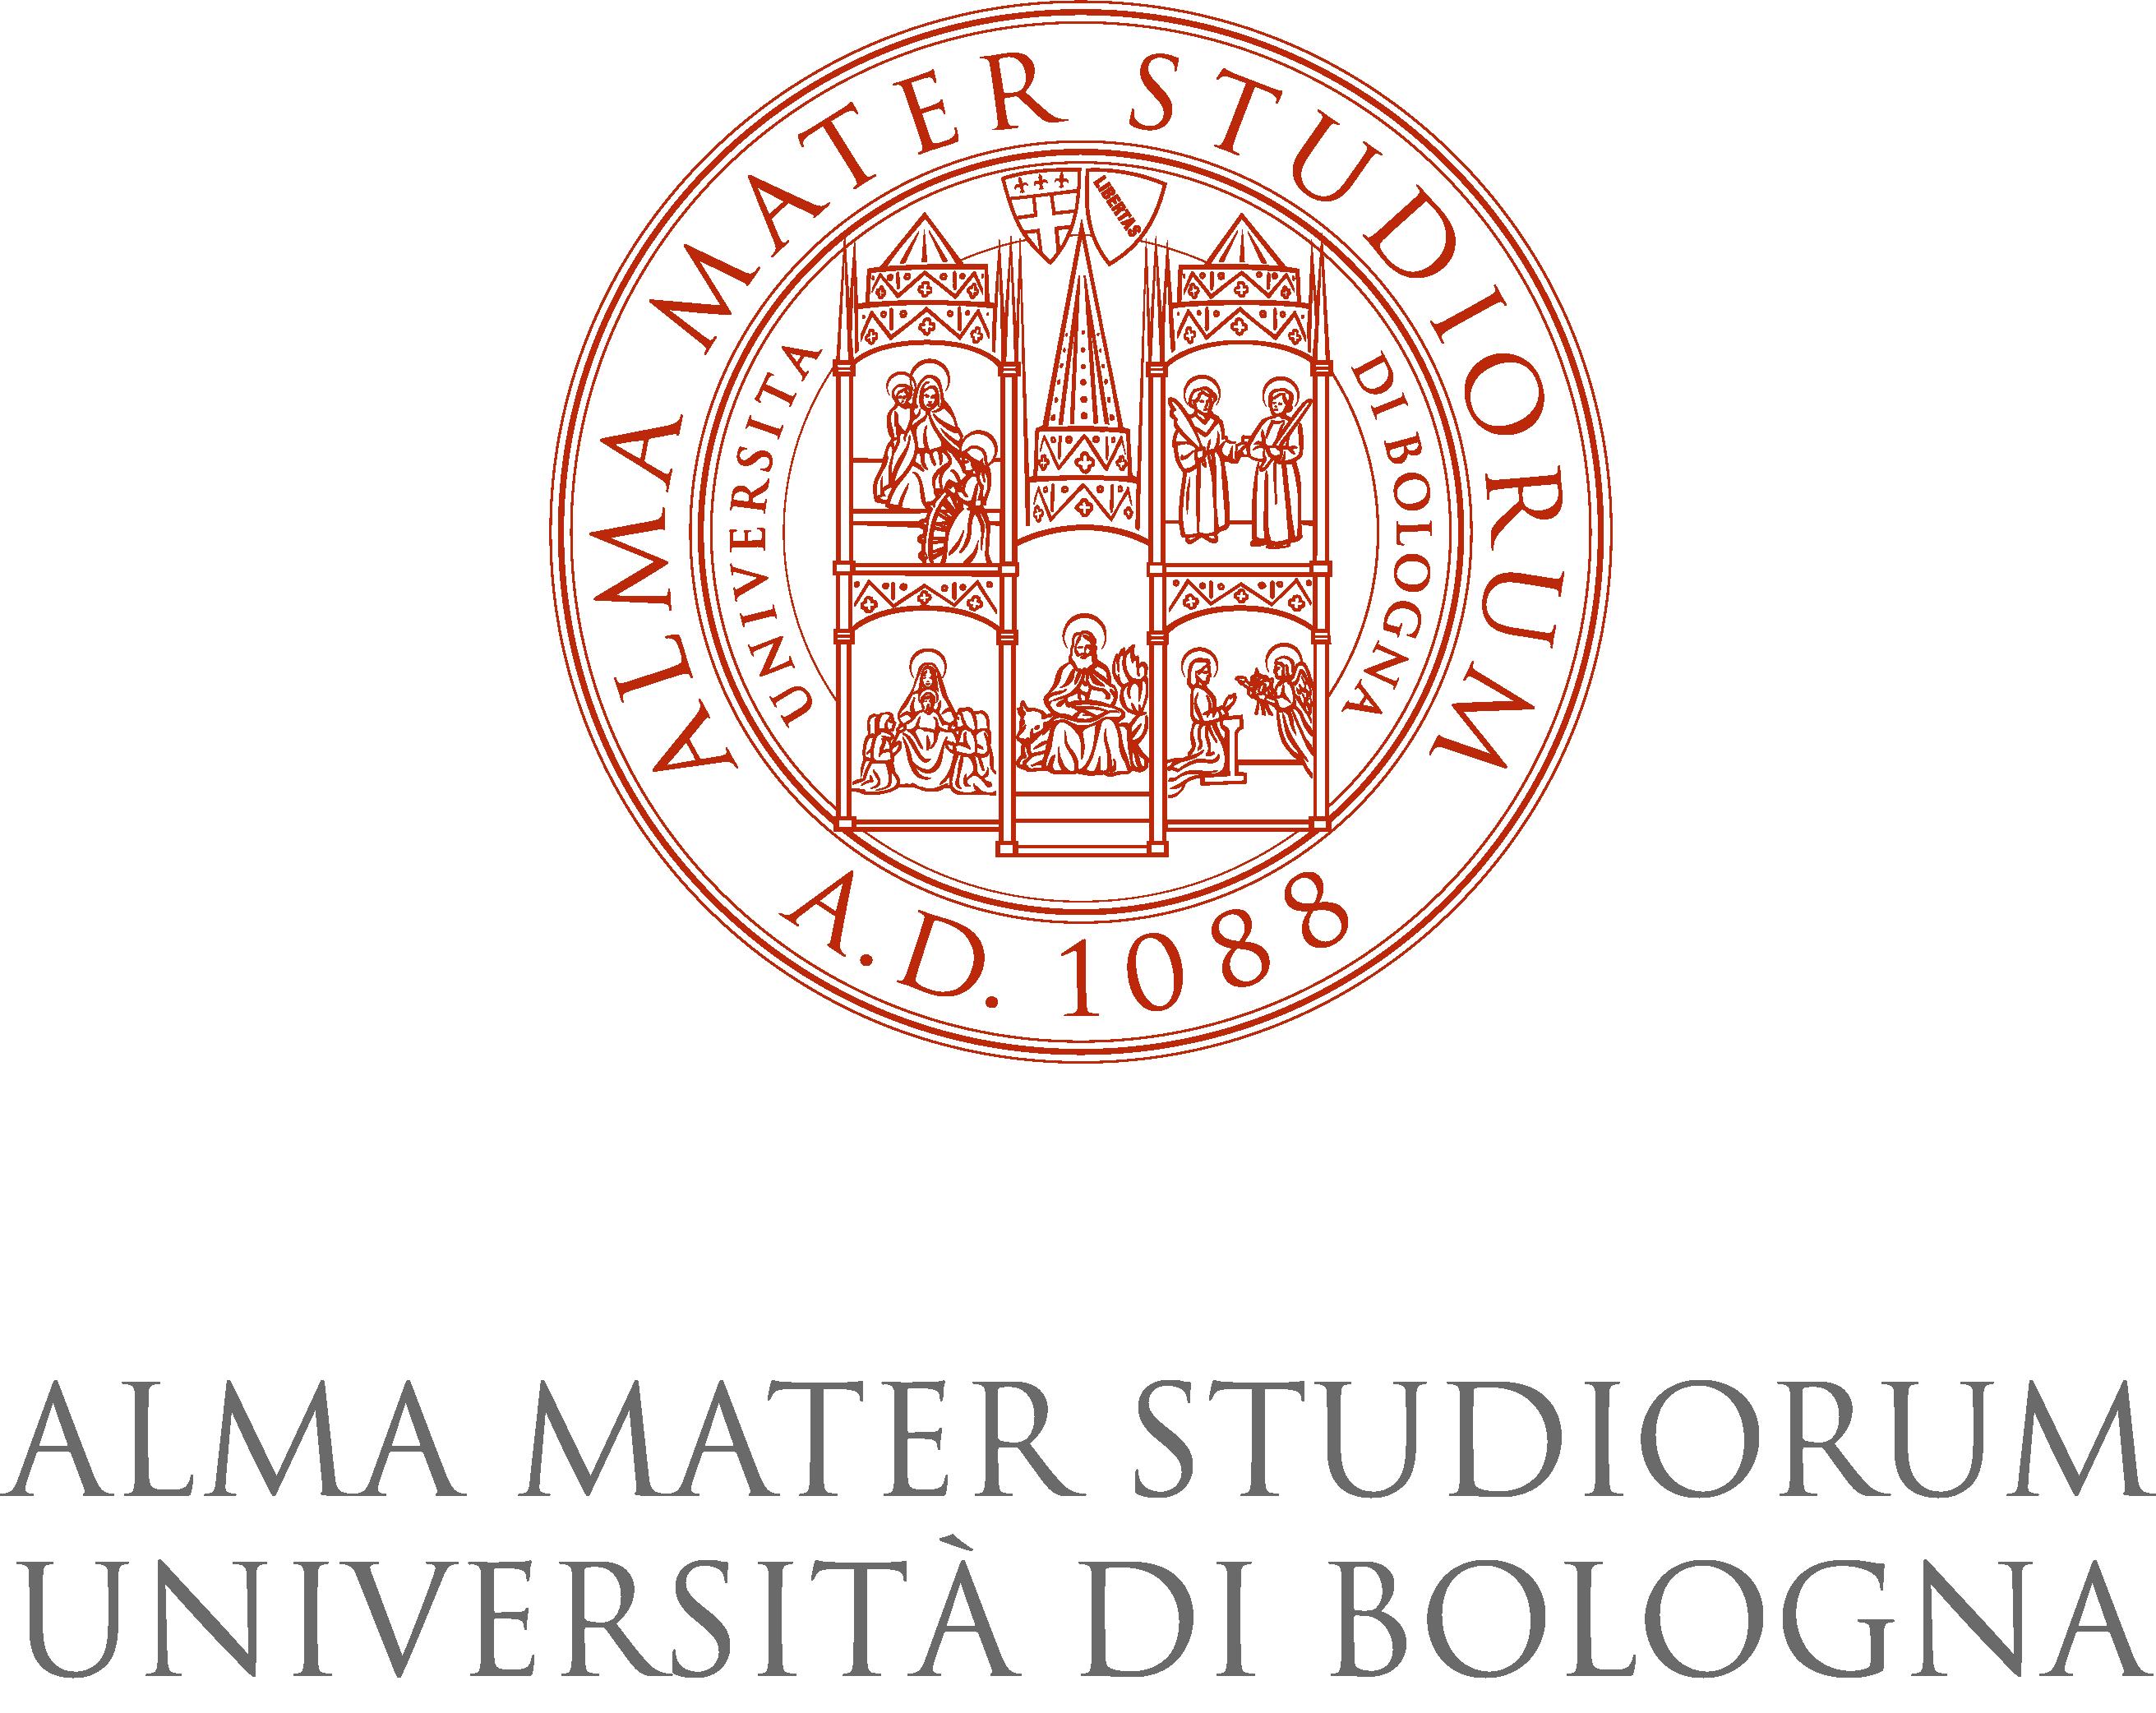 Alm Mater Studiorum, University of Bologna